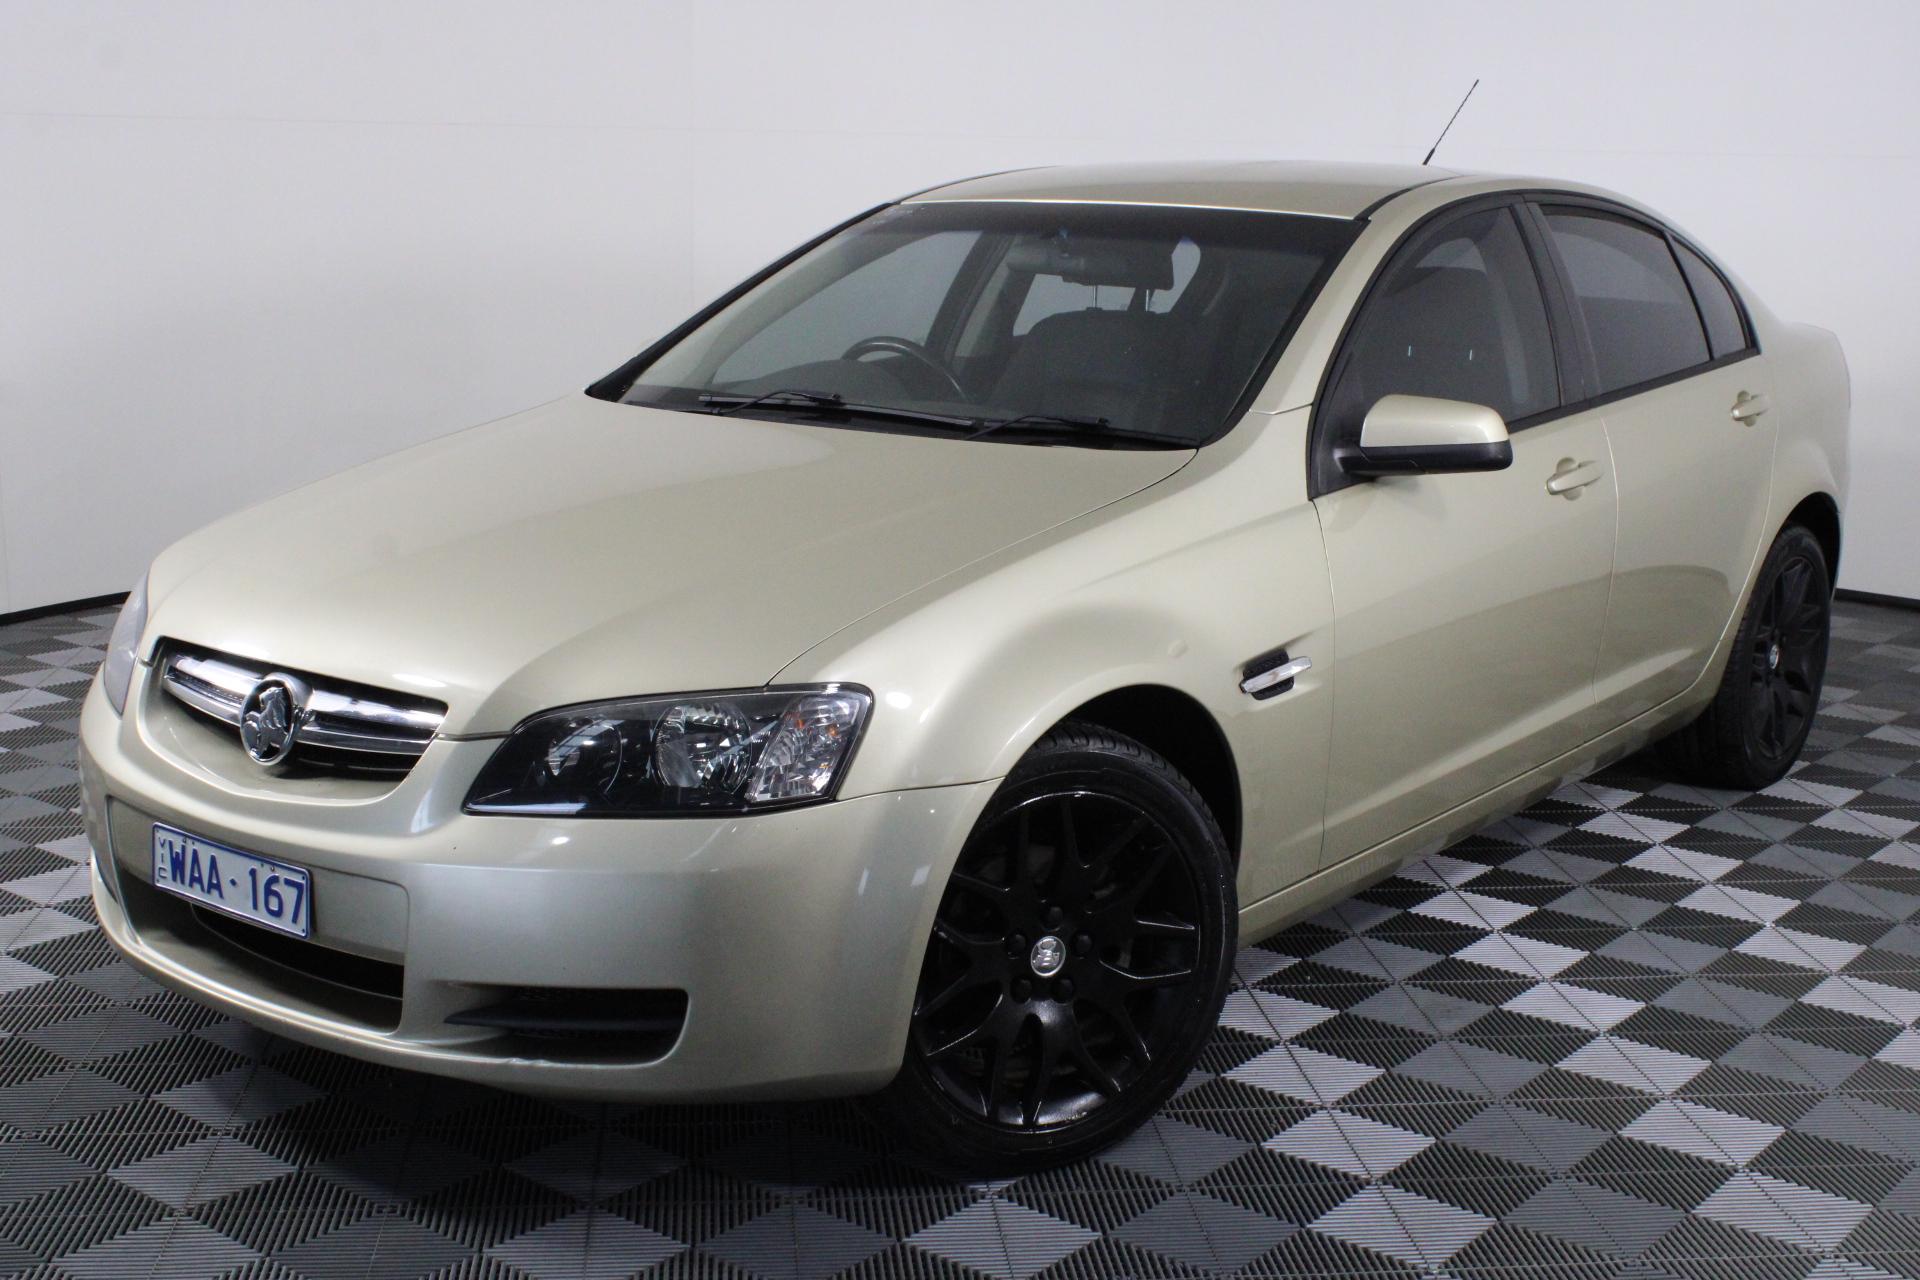 2008 Holden Commodore Lumina VE Automatic Sedan